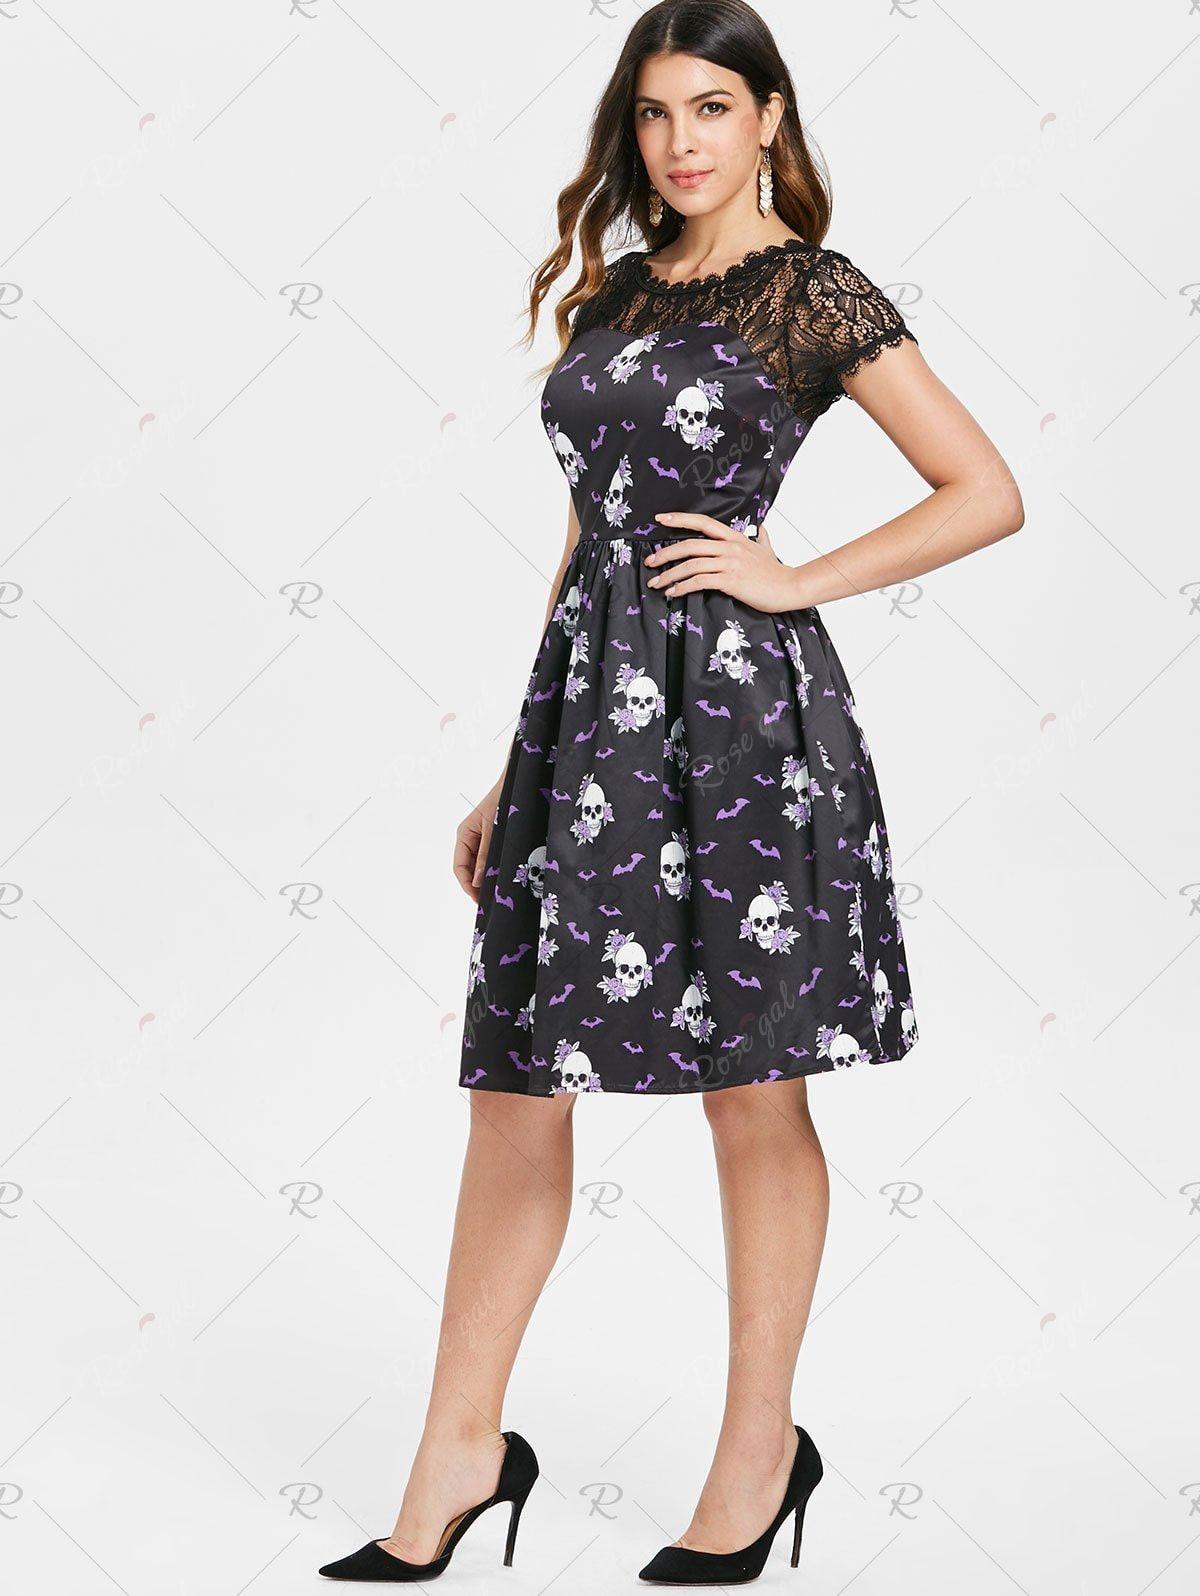 3d53e6857157 Black #Skull #Floral #Print #Halloween Swing #Dress ••• Express your ...